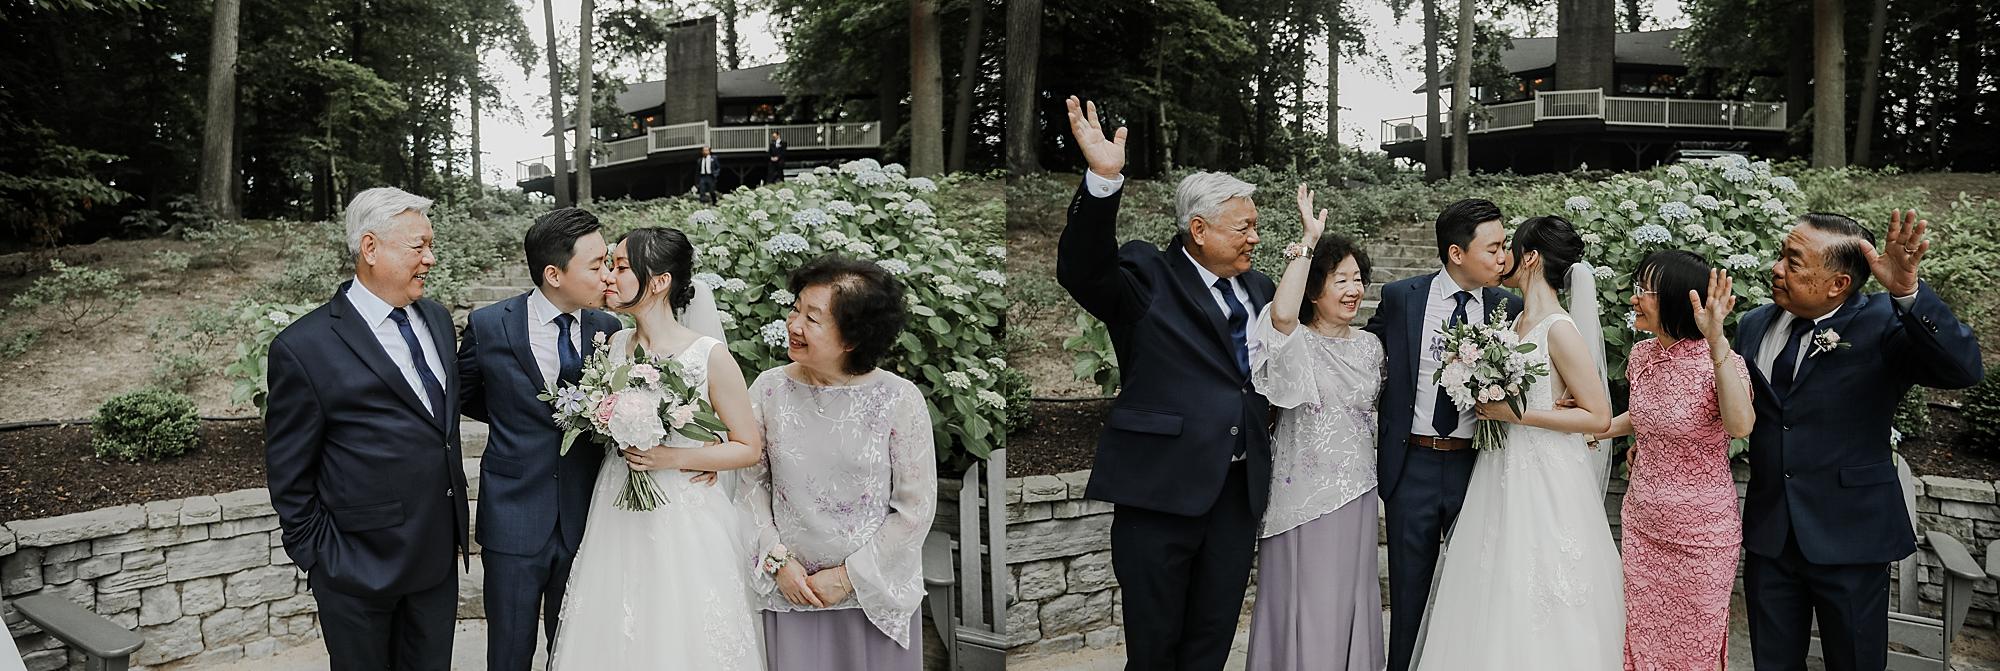 at-home wedding